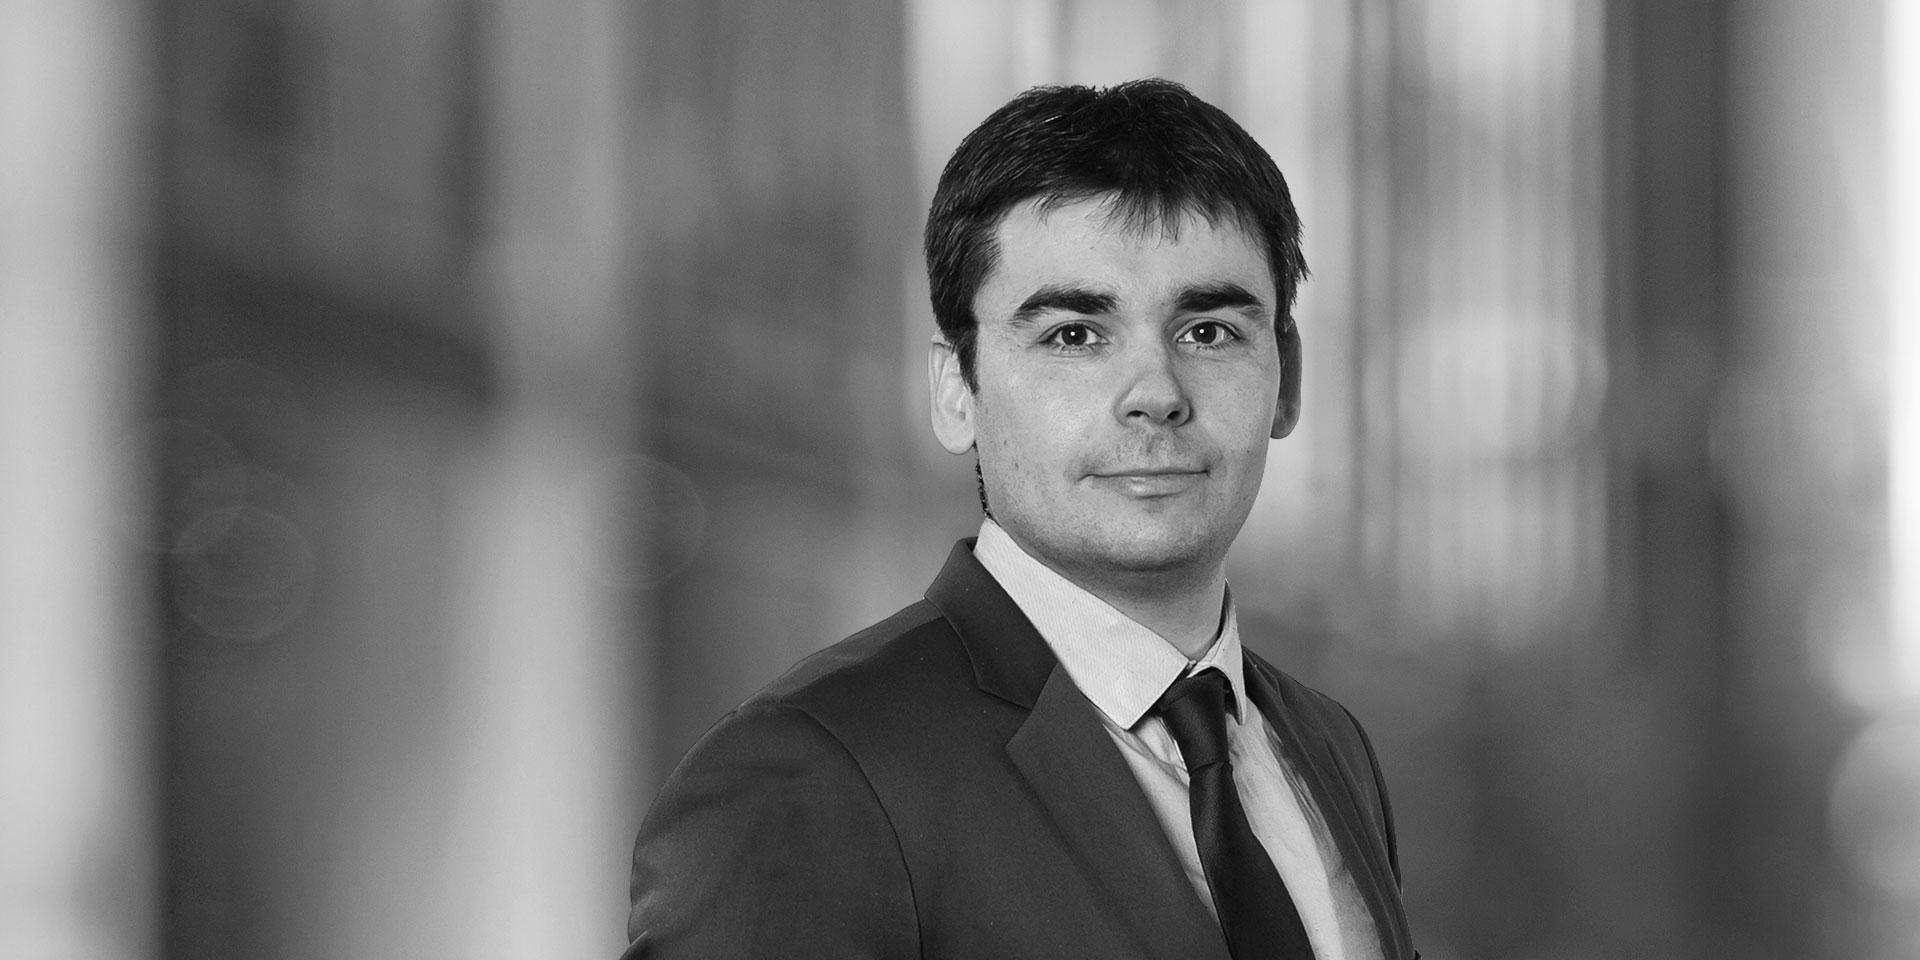 Dimitar Kondev